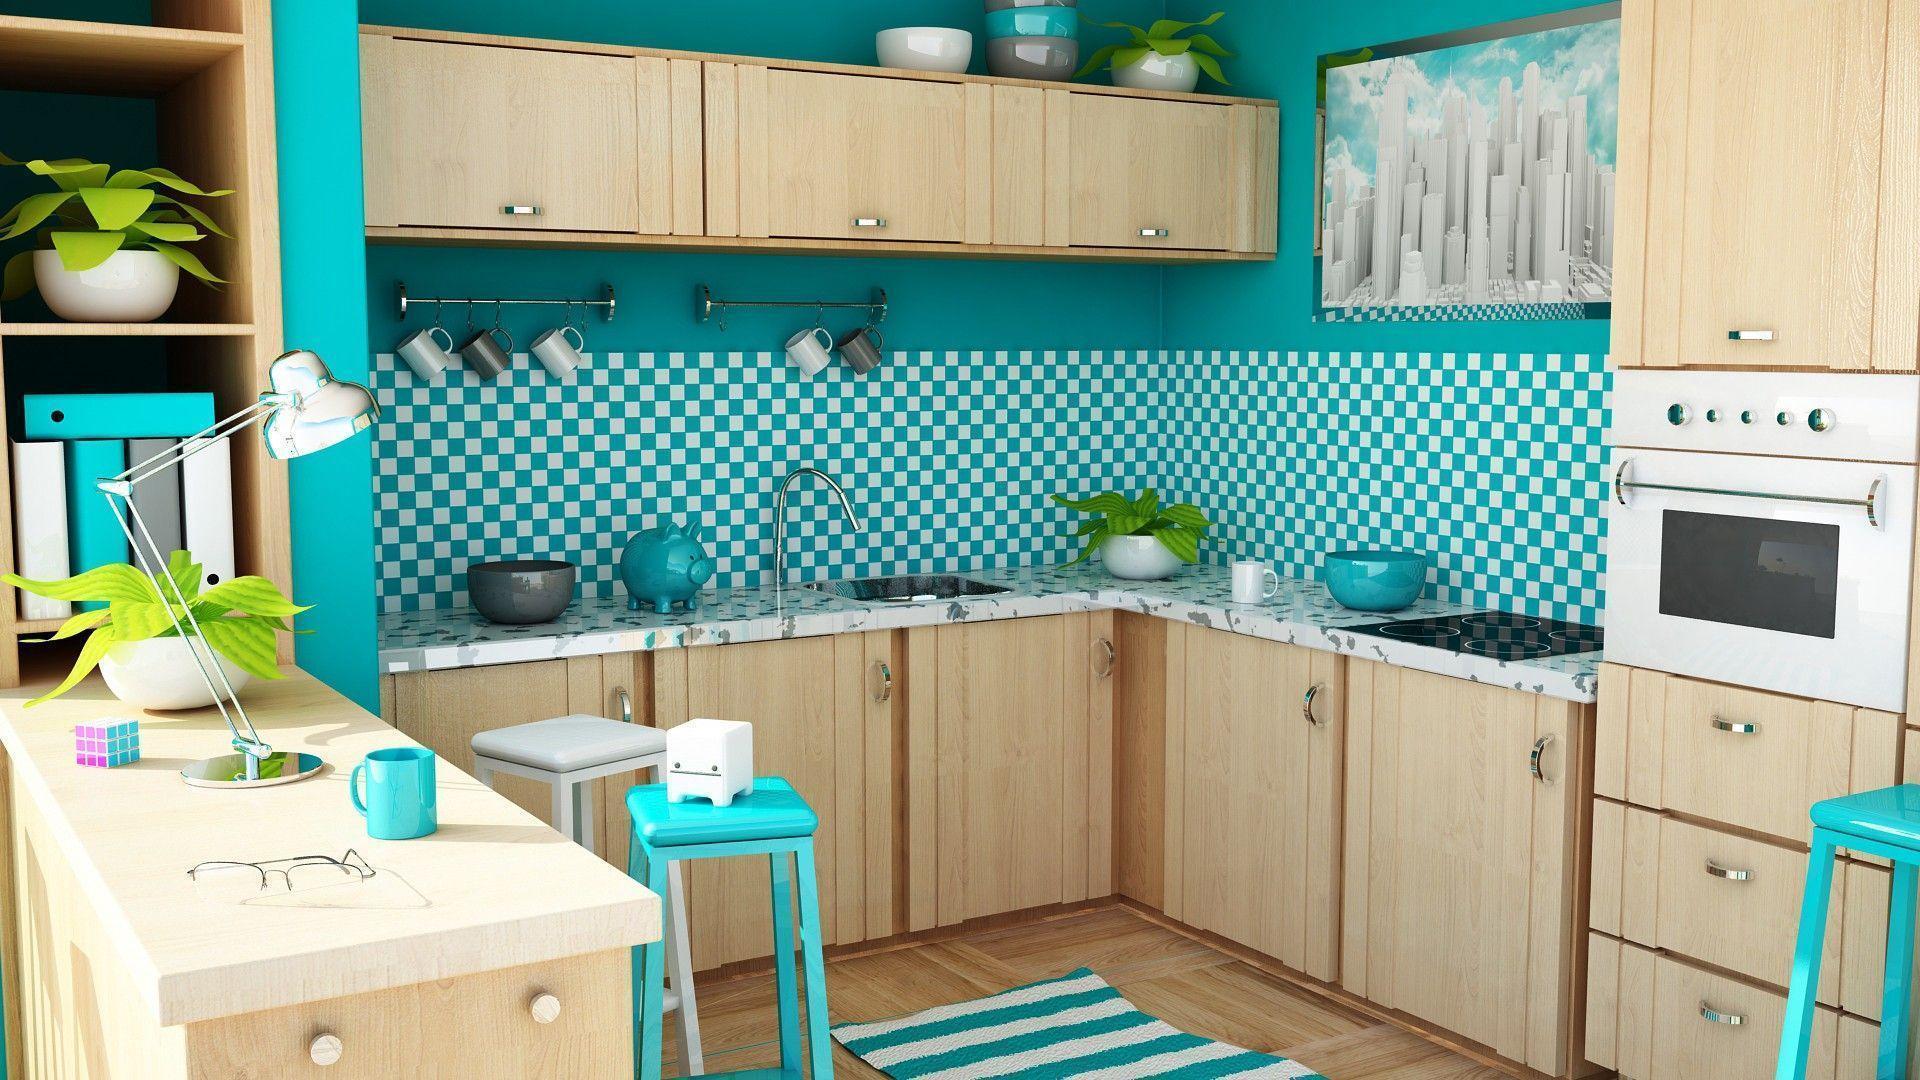 kitchen wallpaper design 4k